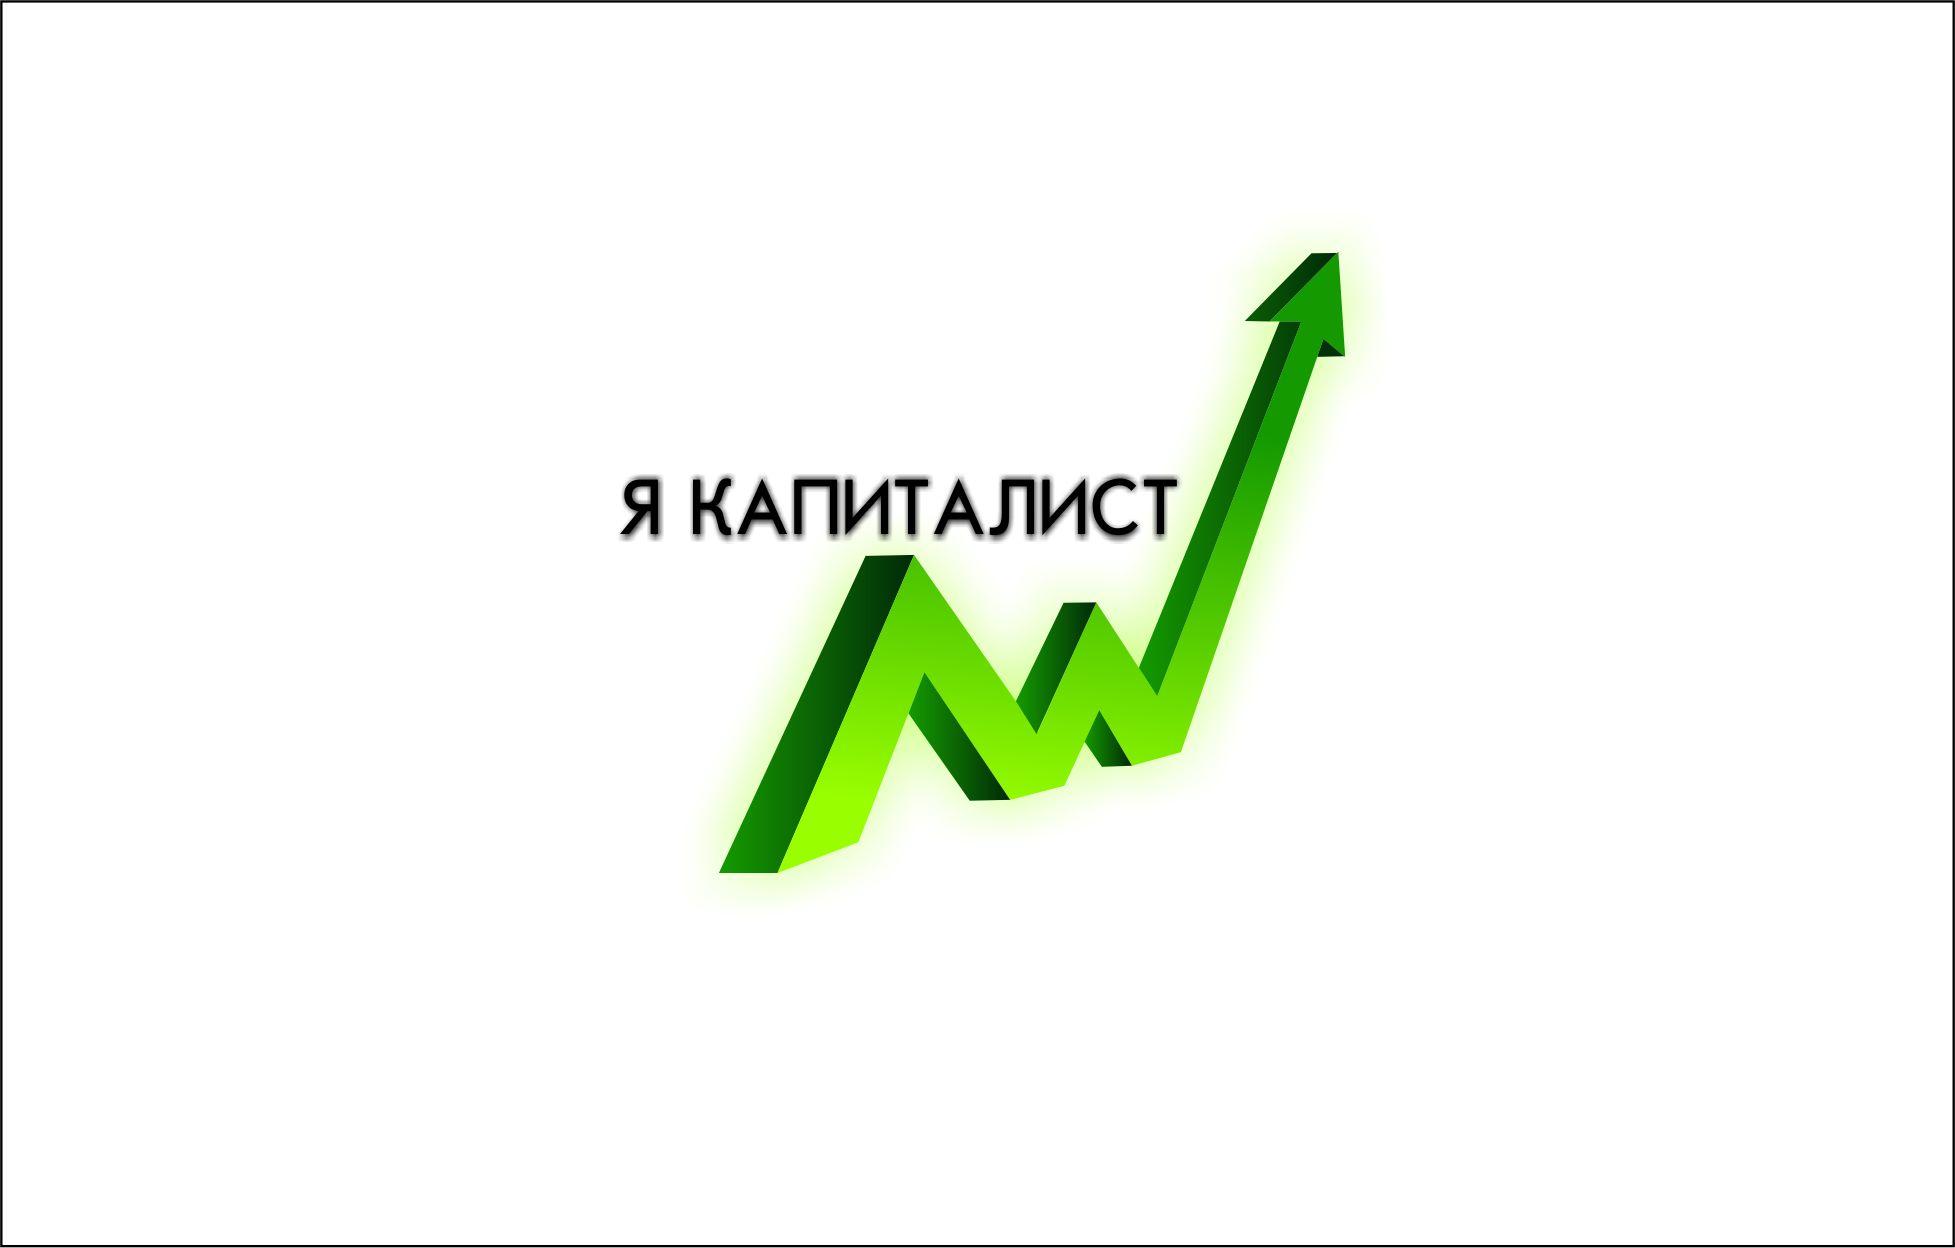 Я капиталист (лого для веб-сайта) - дизайнер La_persona